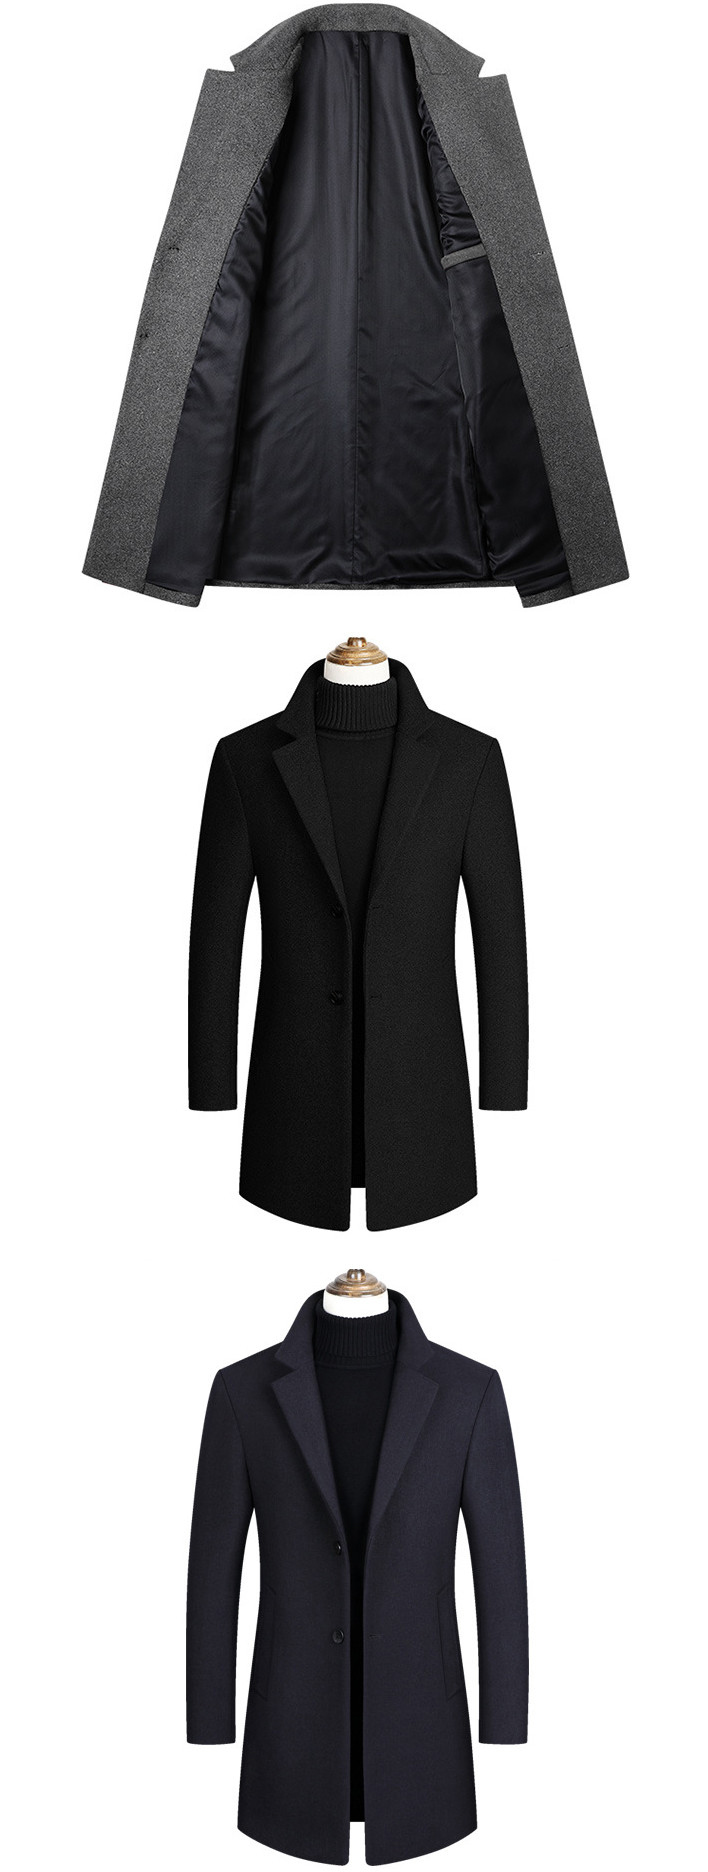 Winter Wool Jacket Men's High-quality Wool Coat casual Slim collar wool coat Men's long cotton collar trench coat 8